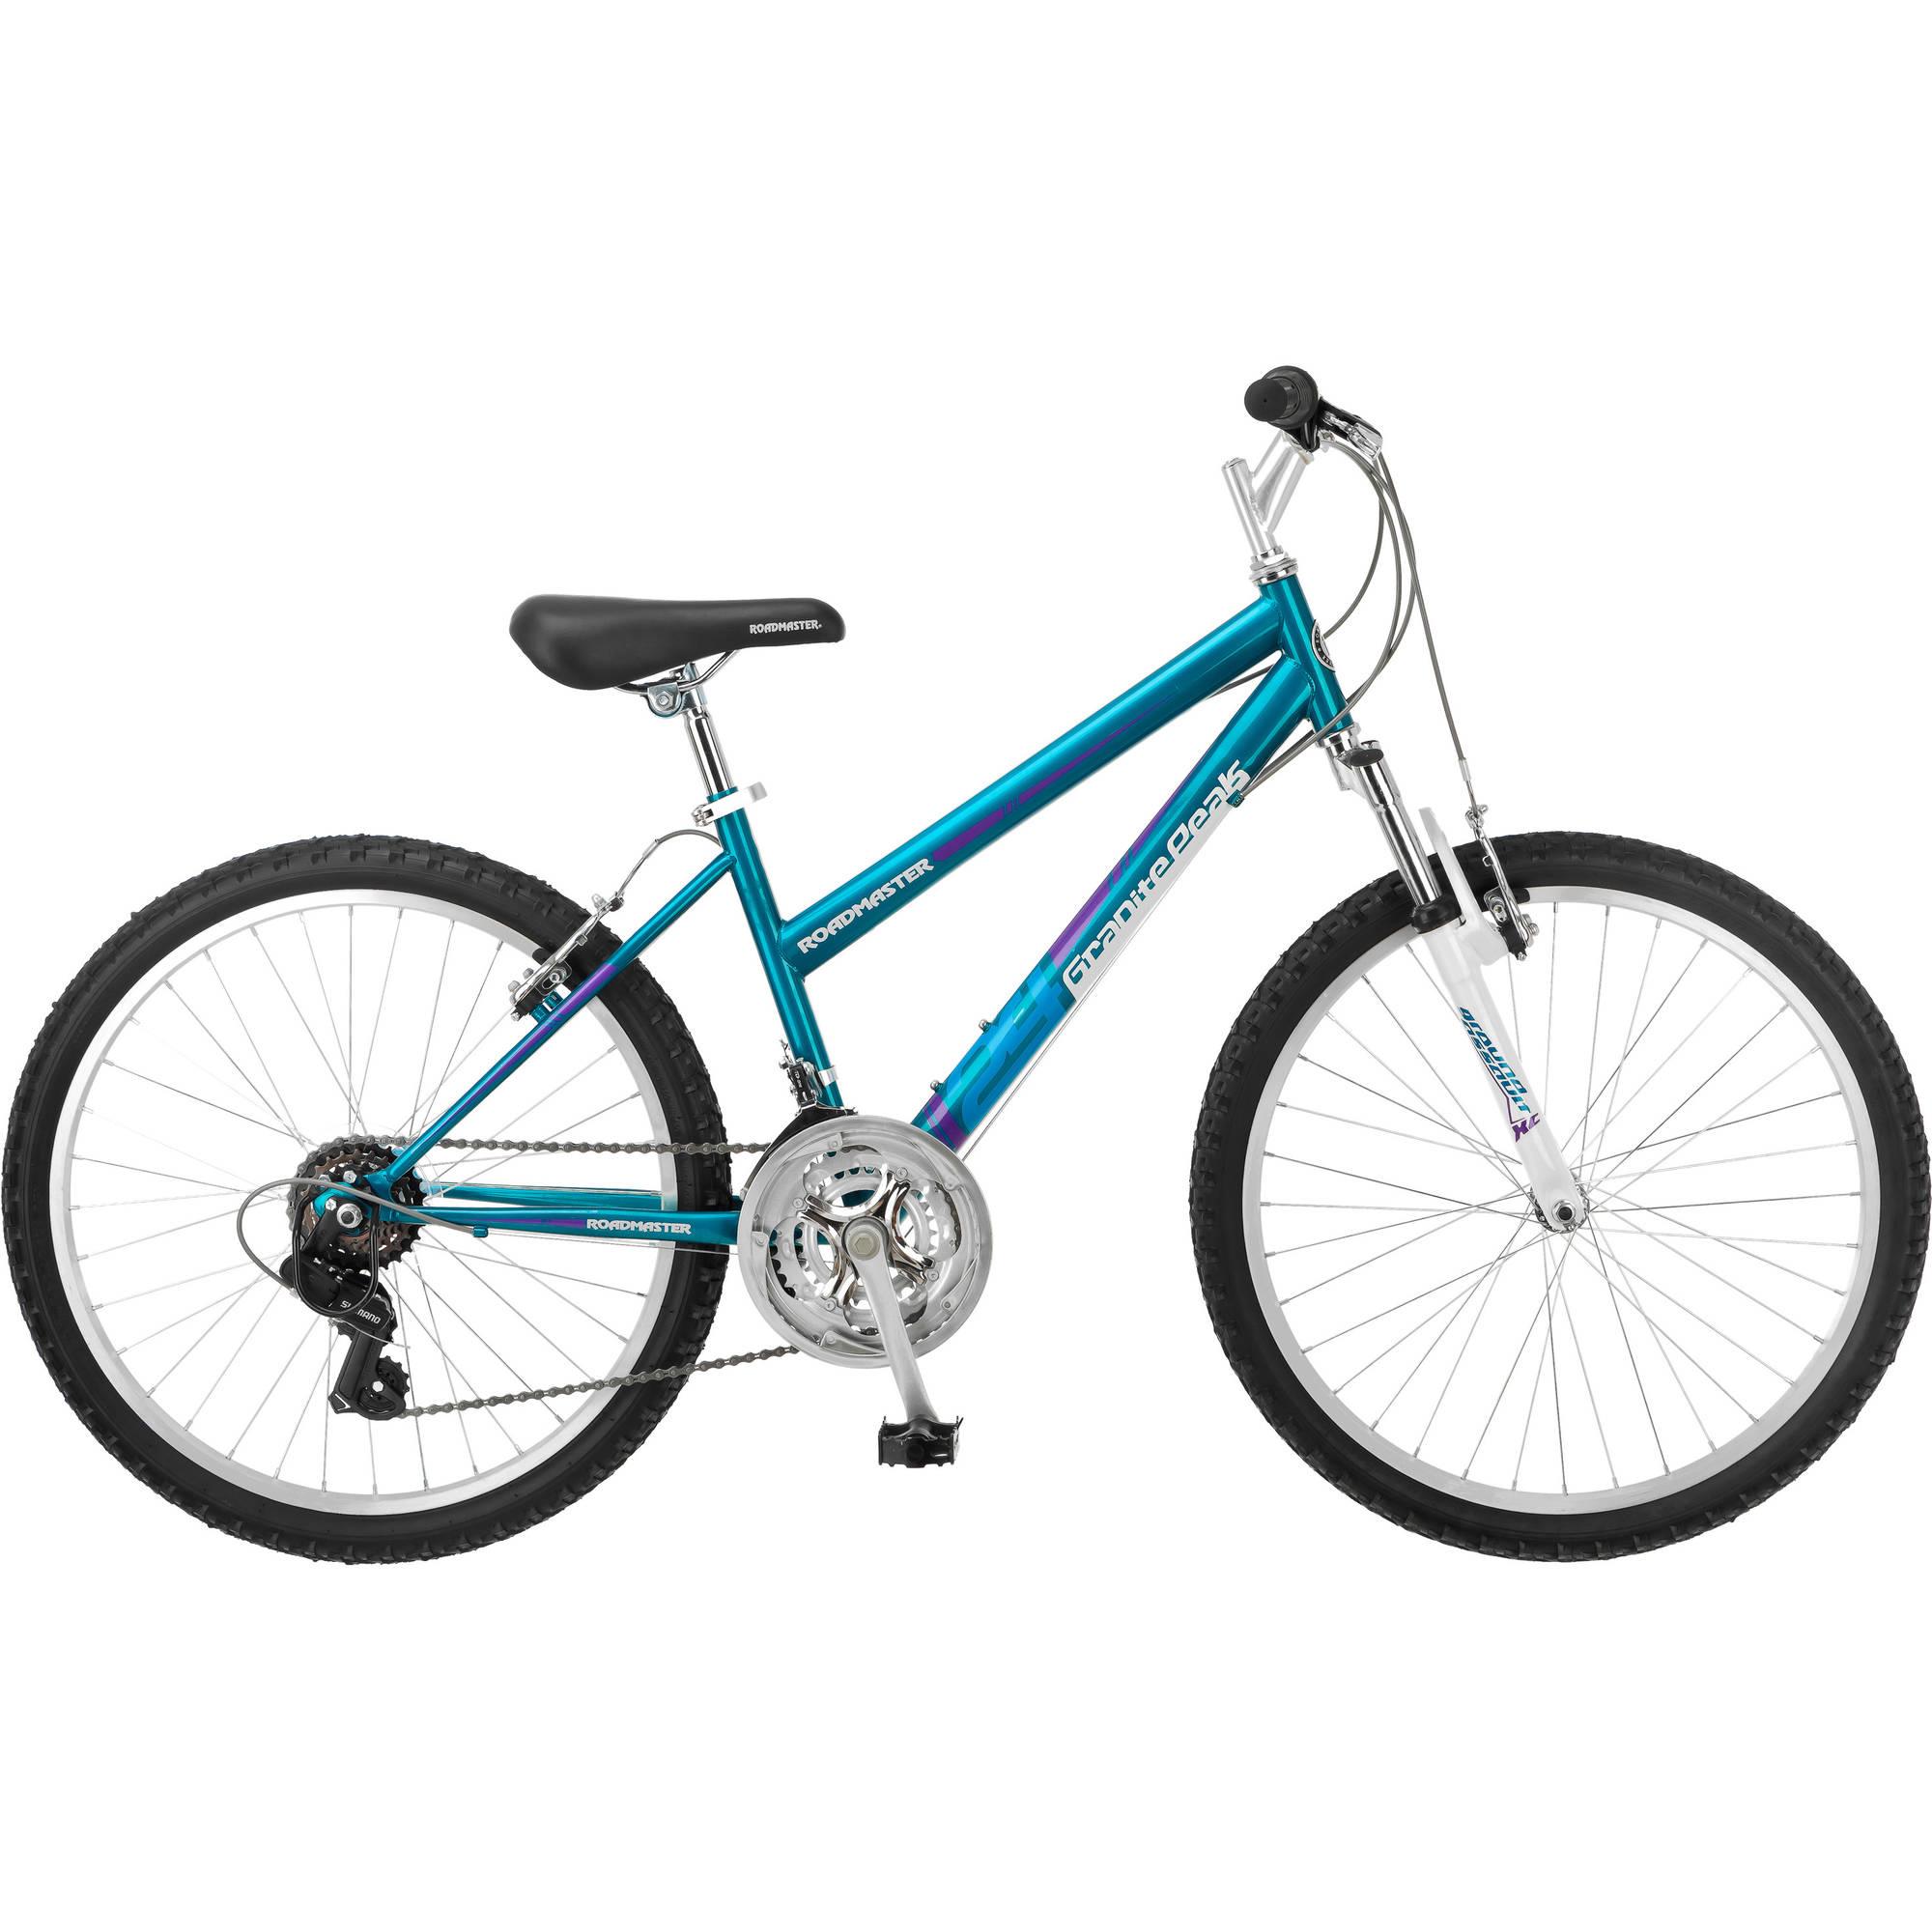 "24"" Roadmaster Granite Peak Girls' Bike"